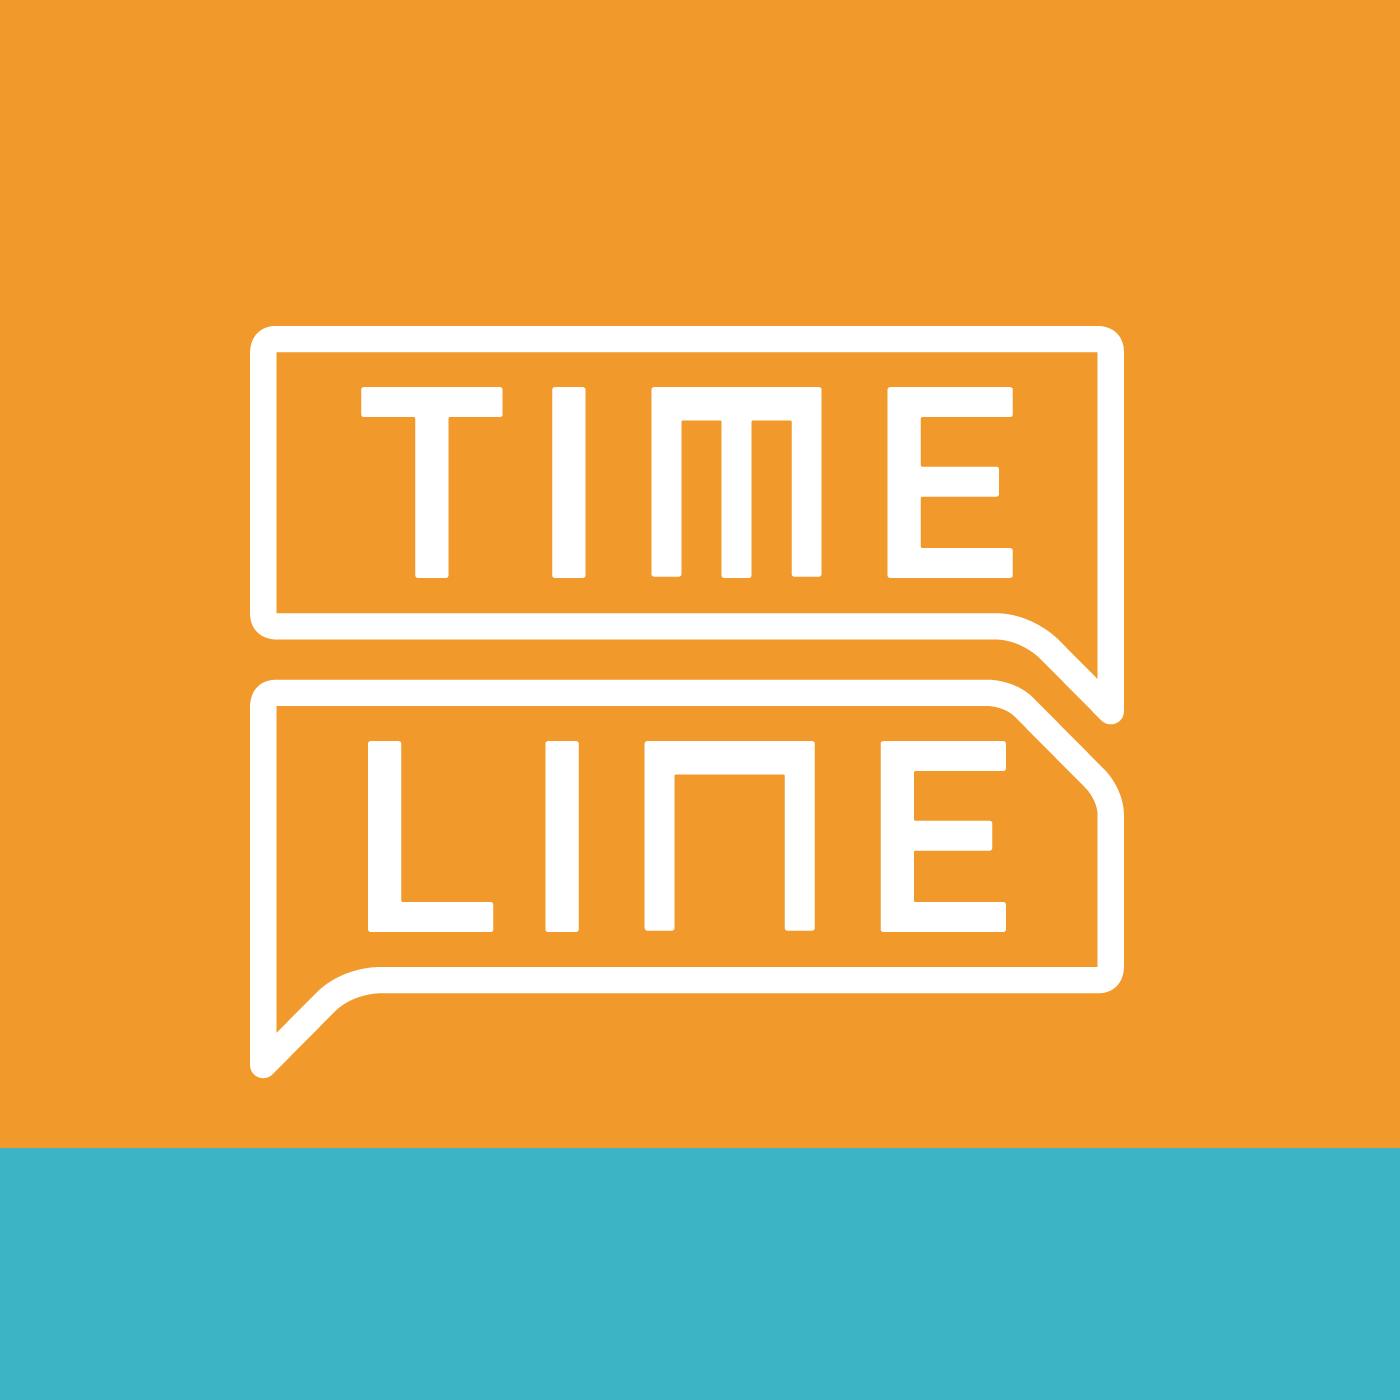 Timeline Gaúcha 12/12/2017